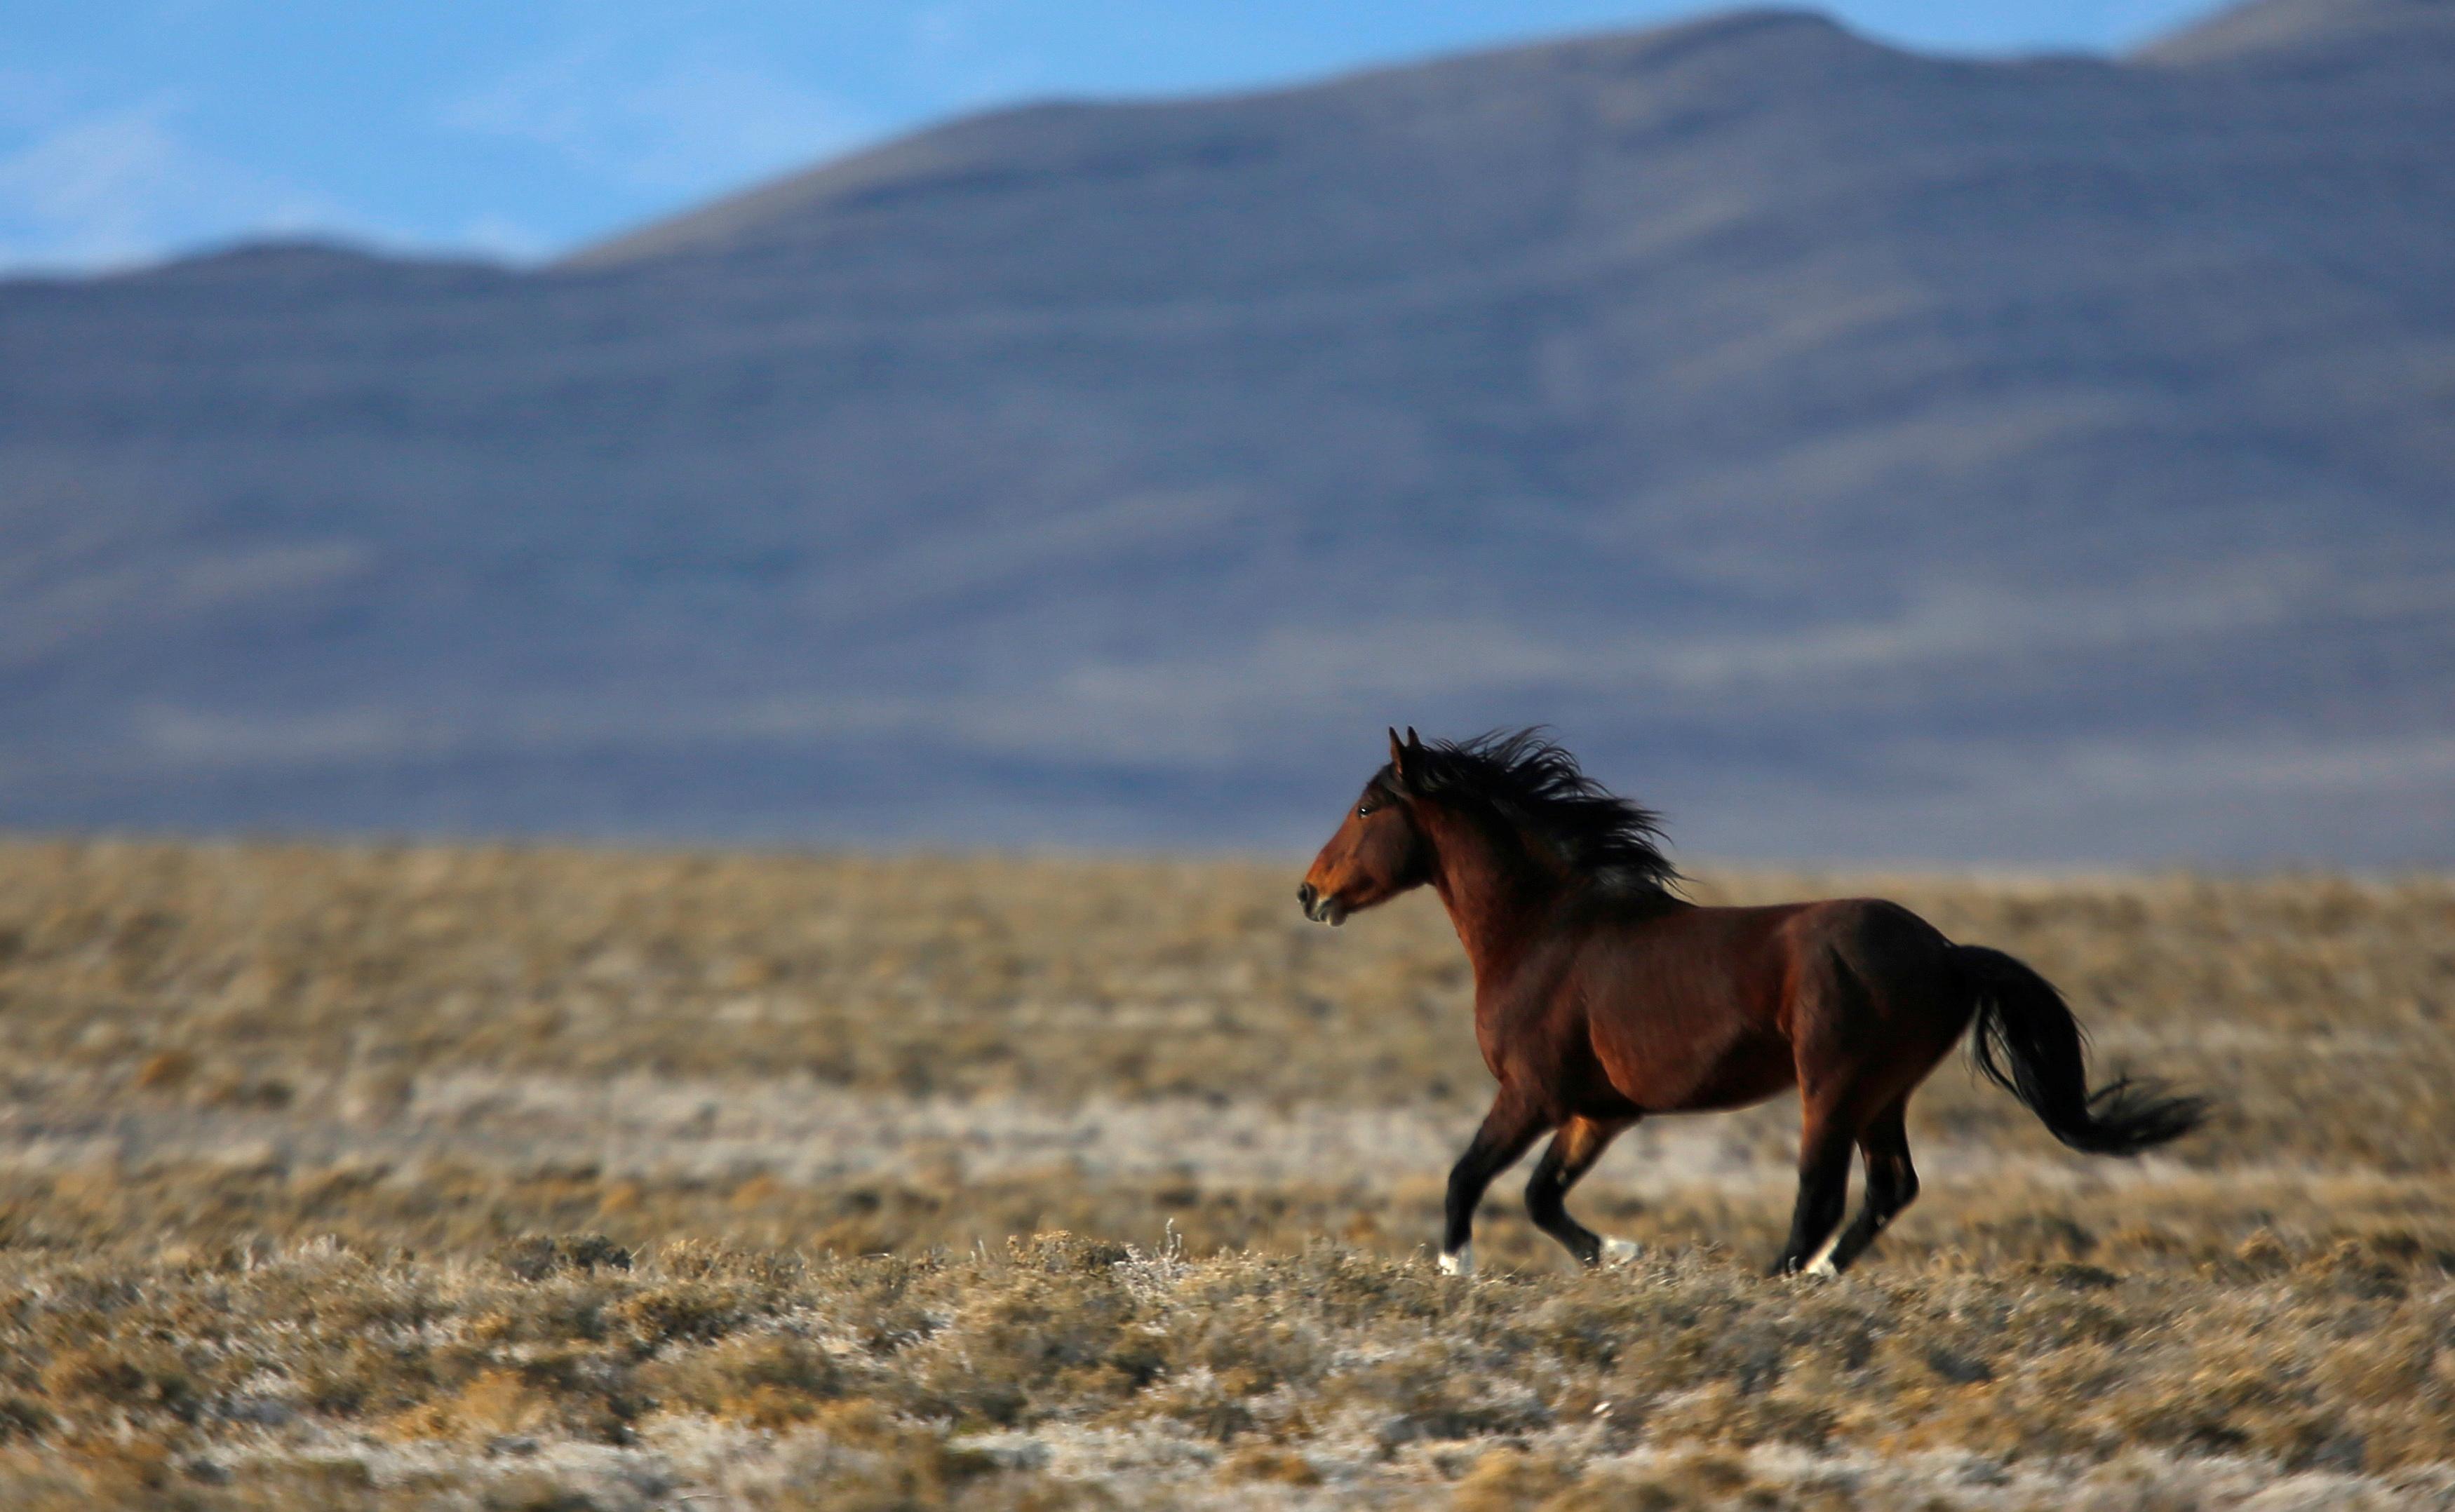 A wild horse gallops across a range as the Bureau of Land Management (BLM) gathers horses along Highway 21 near the Sulphur Herd Management Area south of Garrison, Utah, February 25, 2015. REUTERS/Jim Urquhart/File Photo